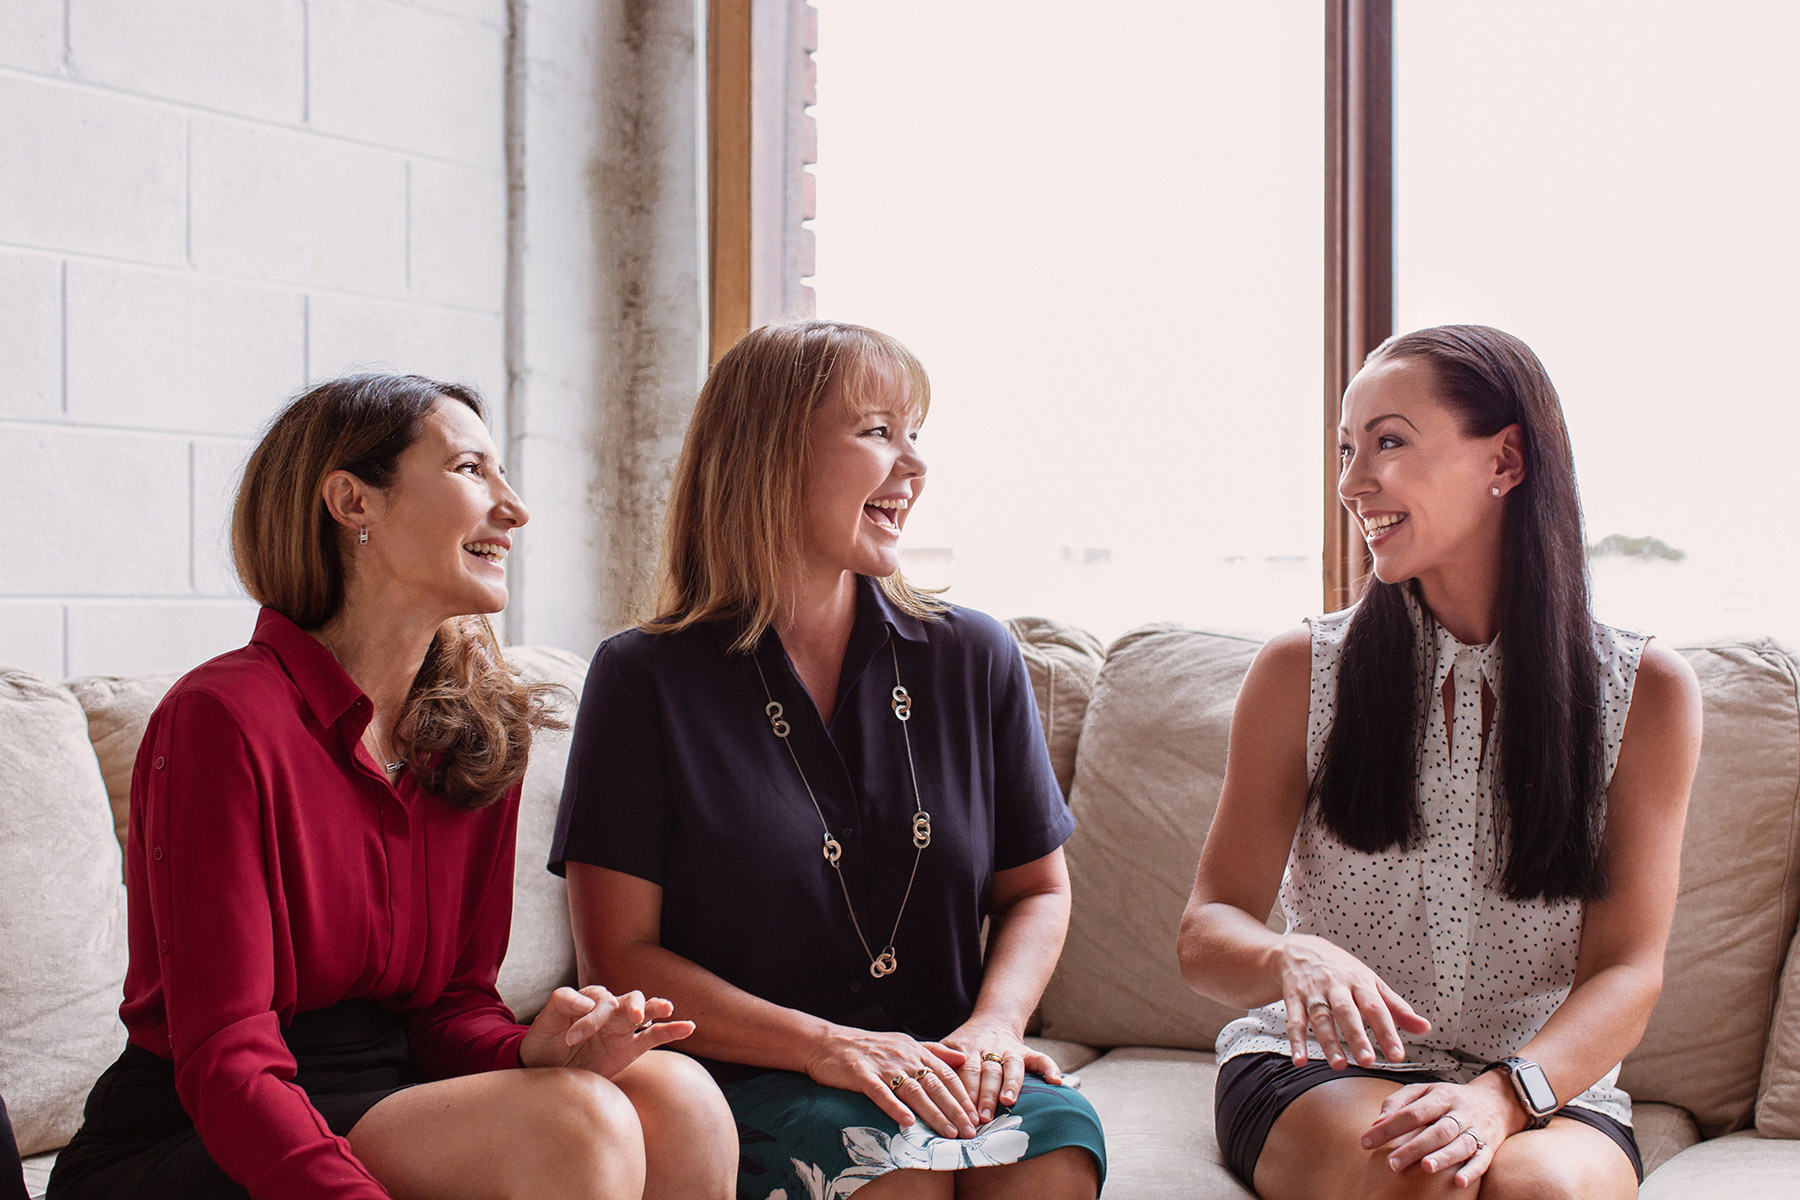 L-R: Karen, Gail, Lynda